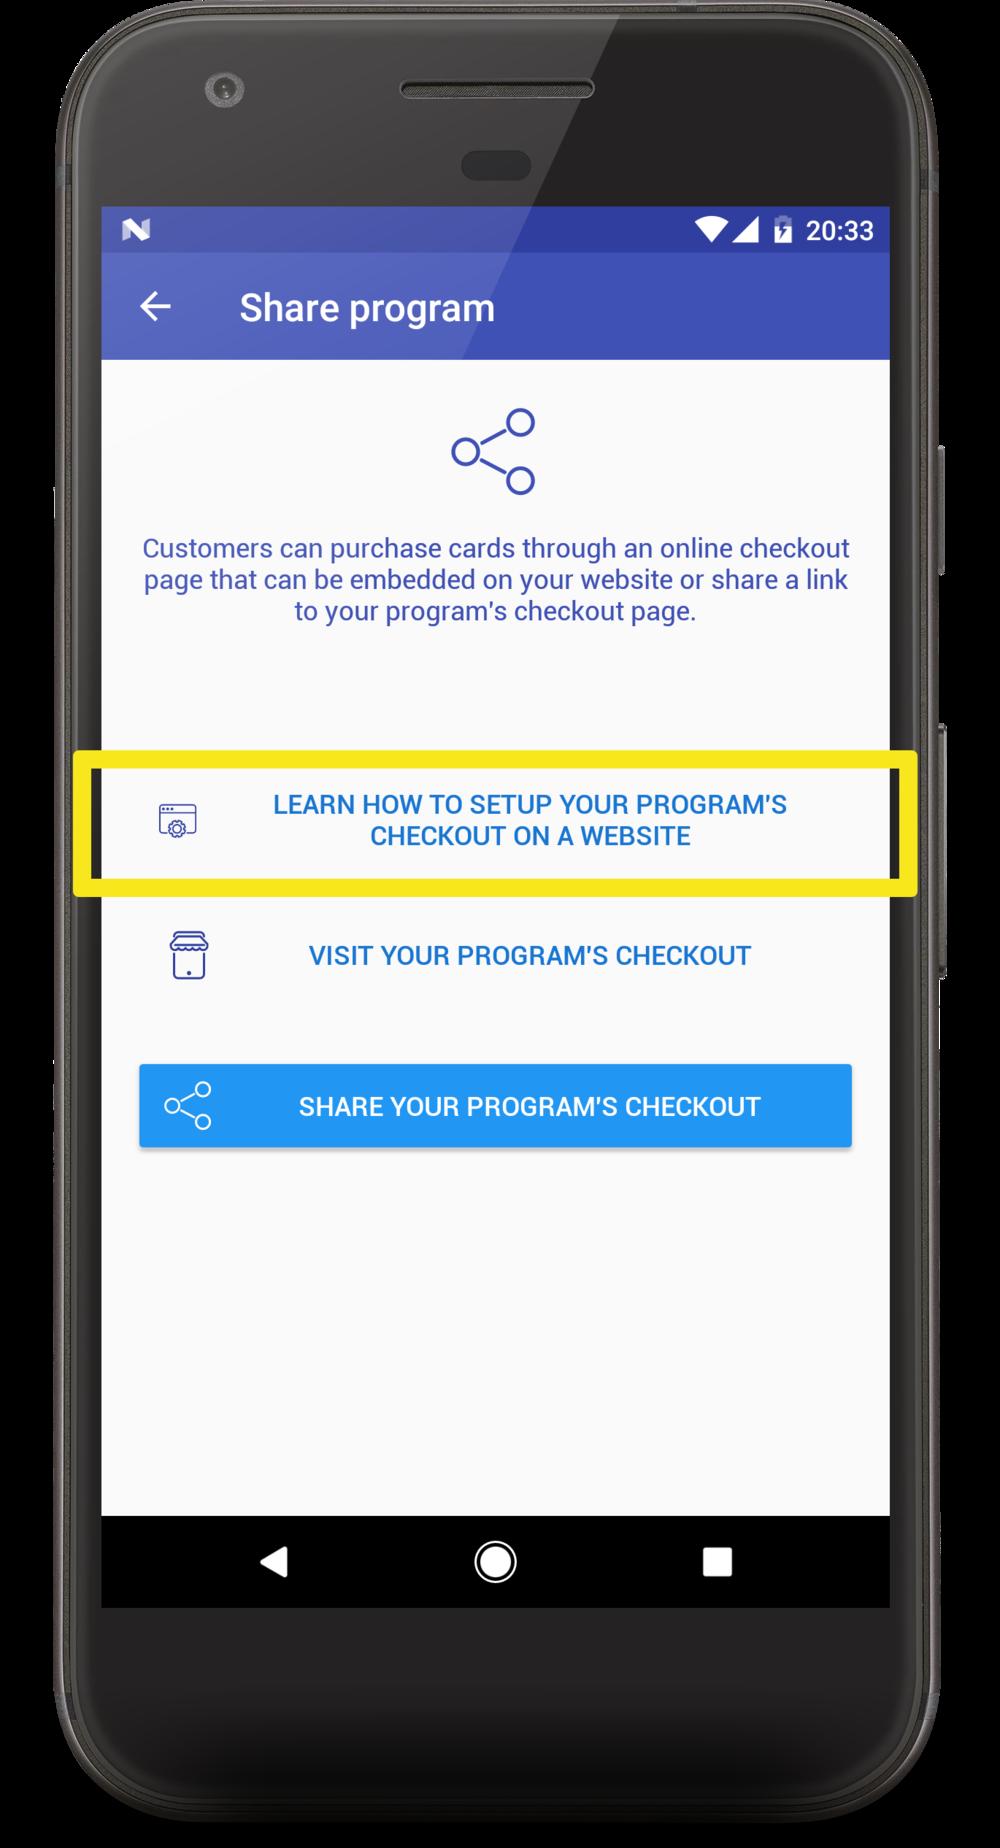 program-home-highlight-visit-checkout-setup-guide.png